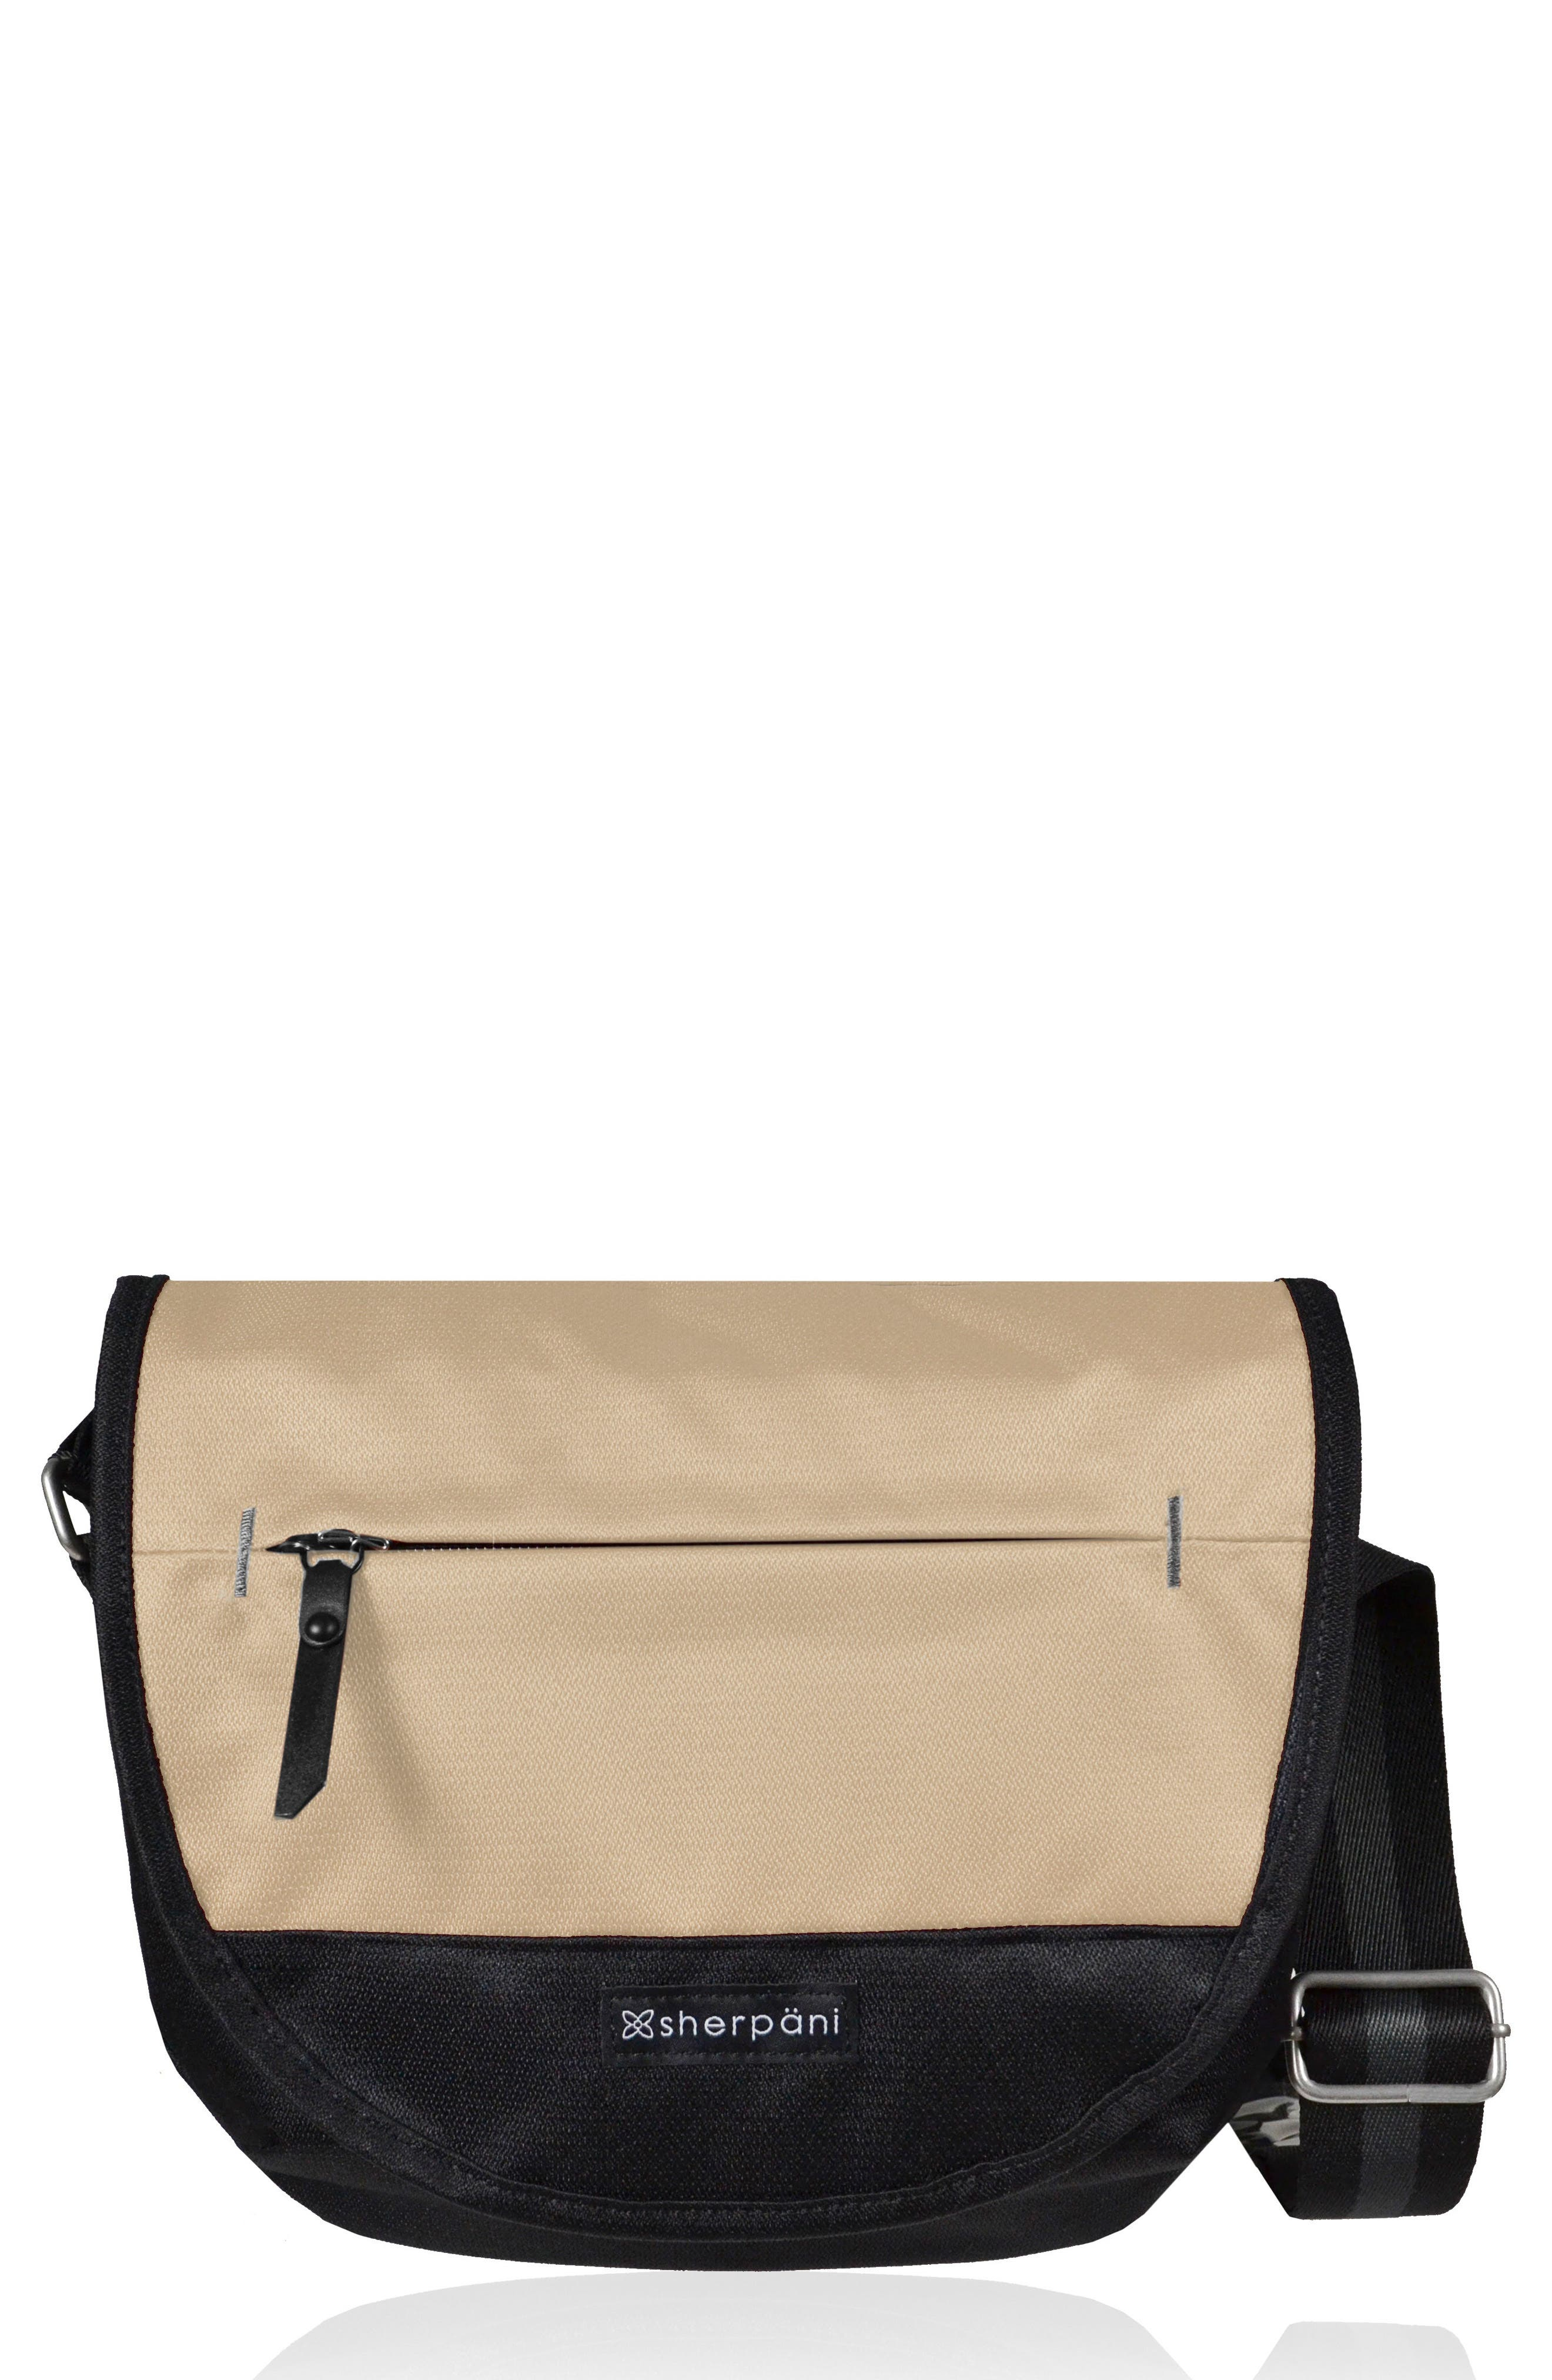 Alternate Image 1 Selected - Sherpani Milli Water Resistant RFID Picket Messenger Bag